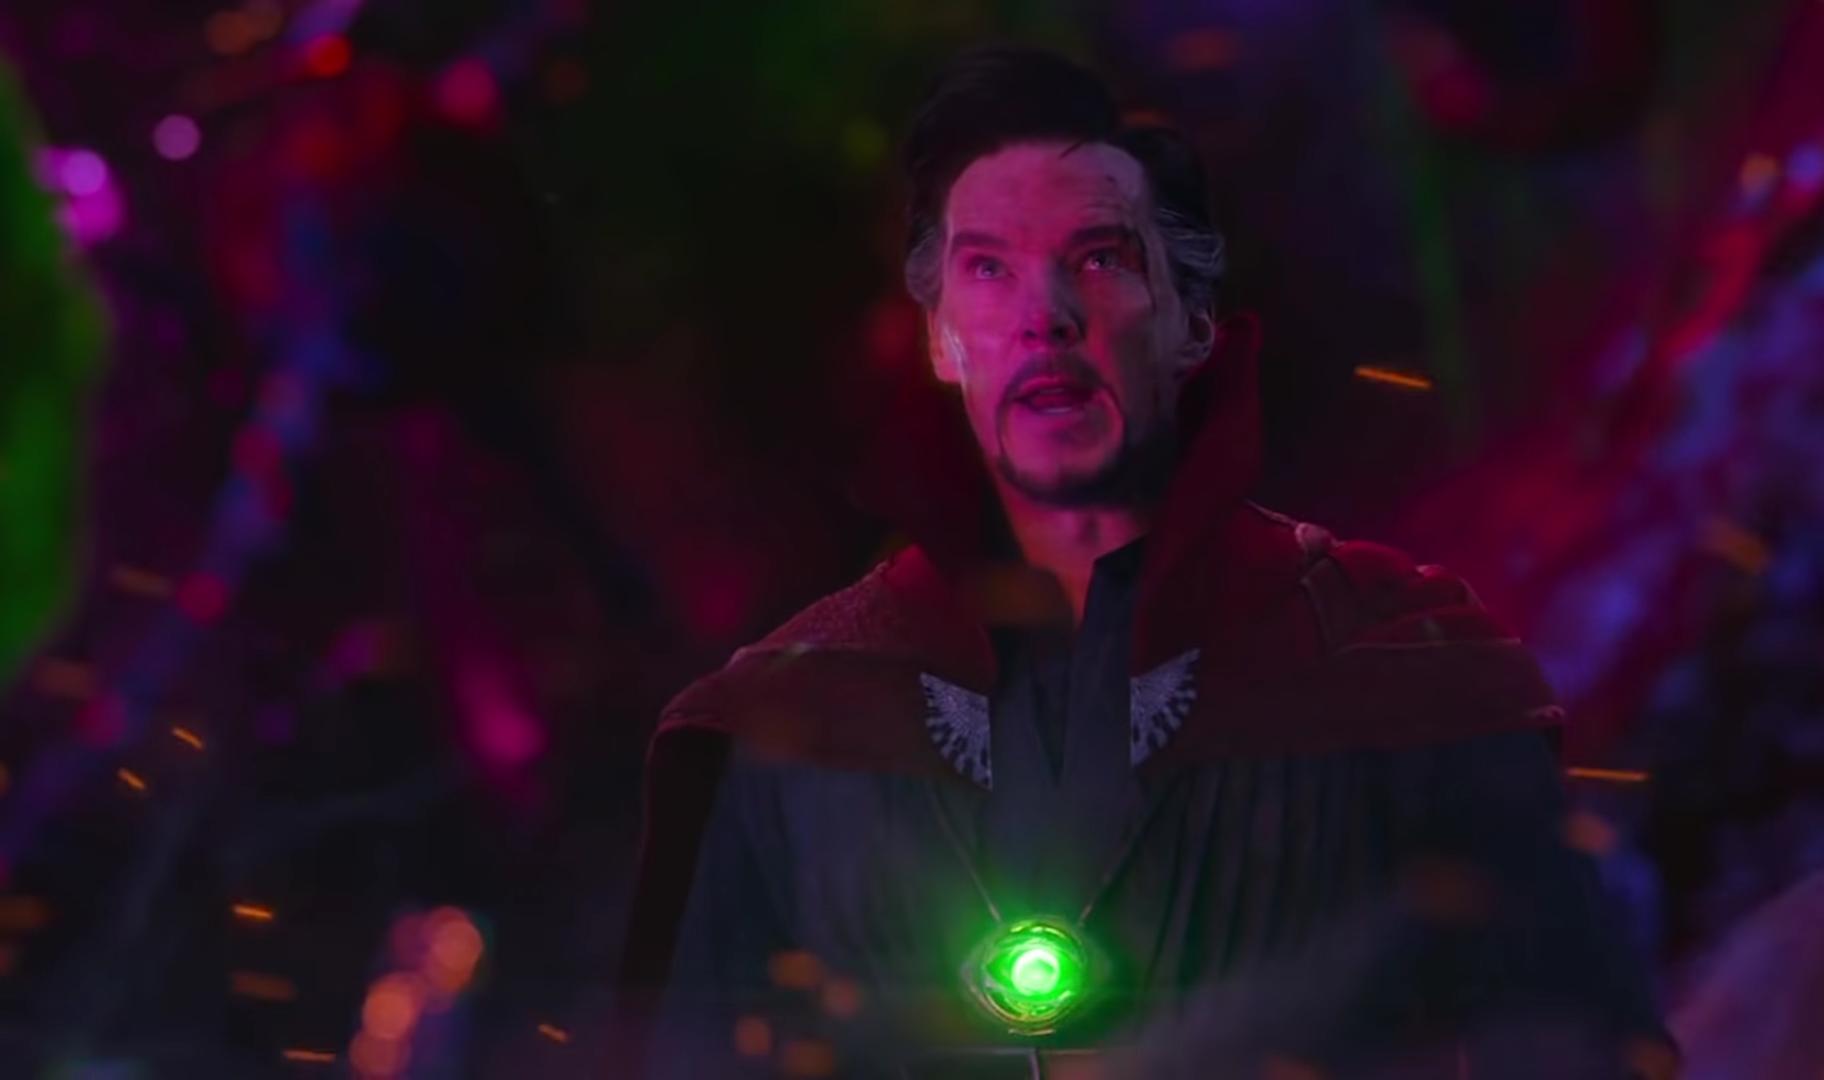 Image Credit: Marvel/Avengers (CBR)